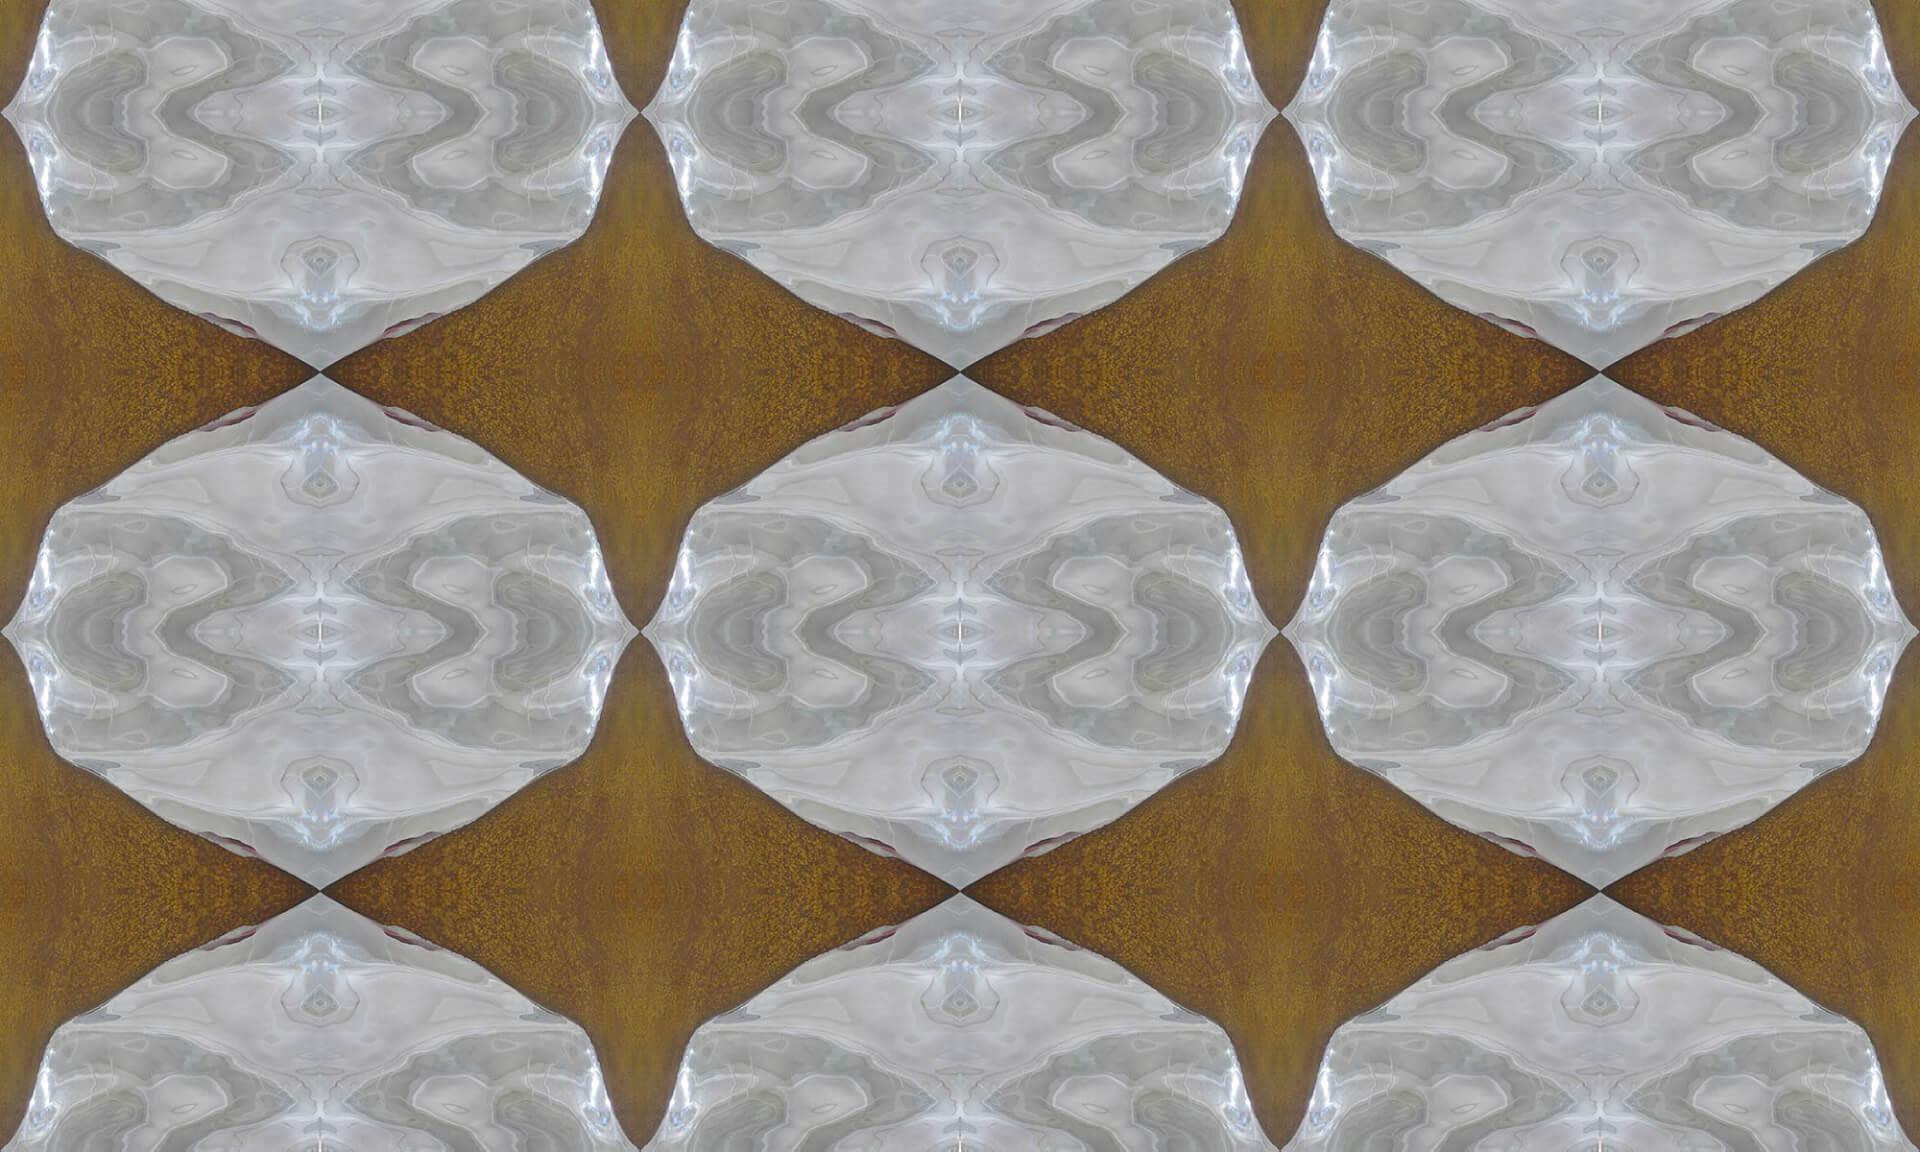 Silver & Rust MA0289 Doug Garrabrants